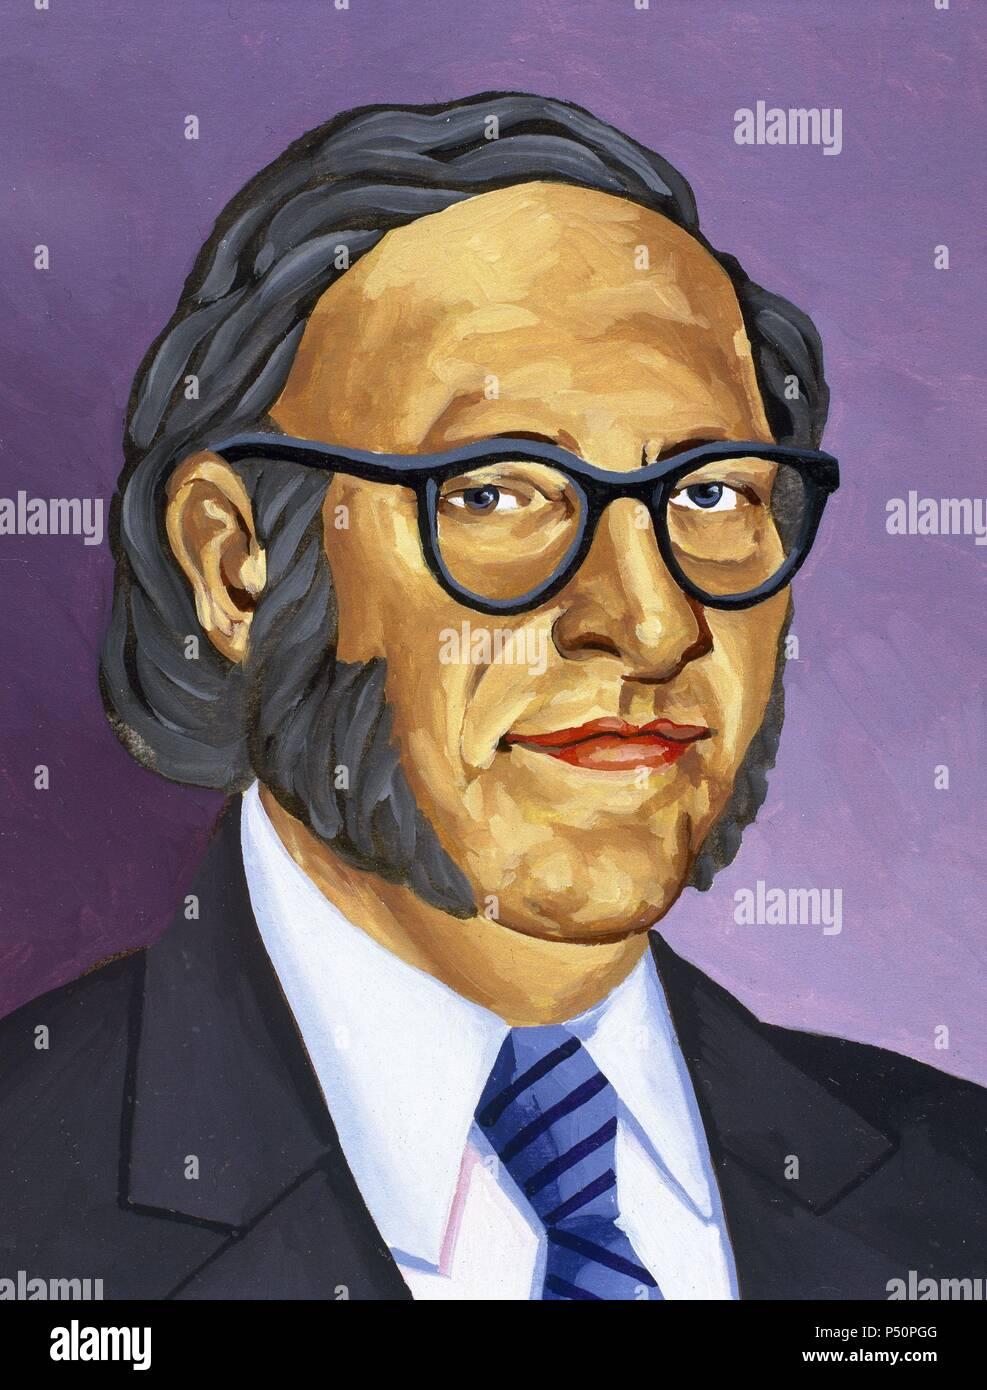 Isaac Asimov (1920-1992). American writer of Russian origin. Colored drawing. - Stock Image